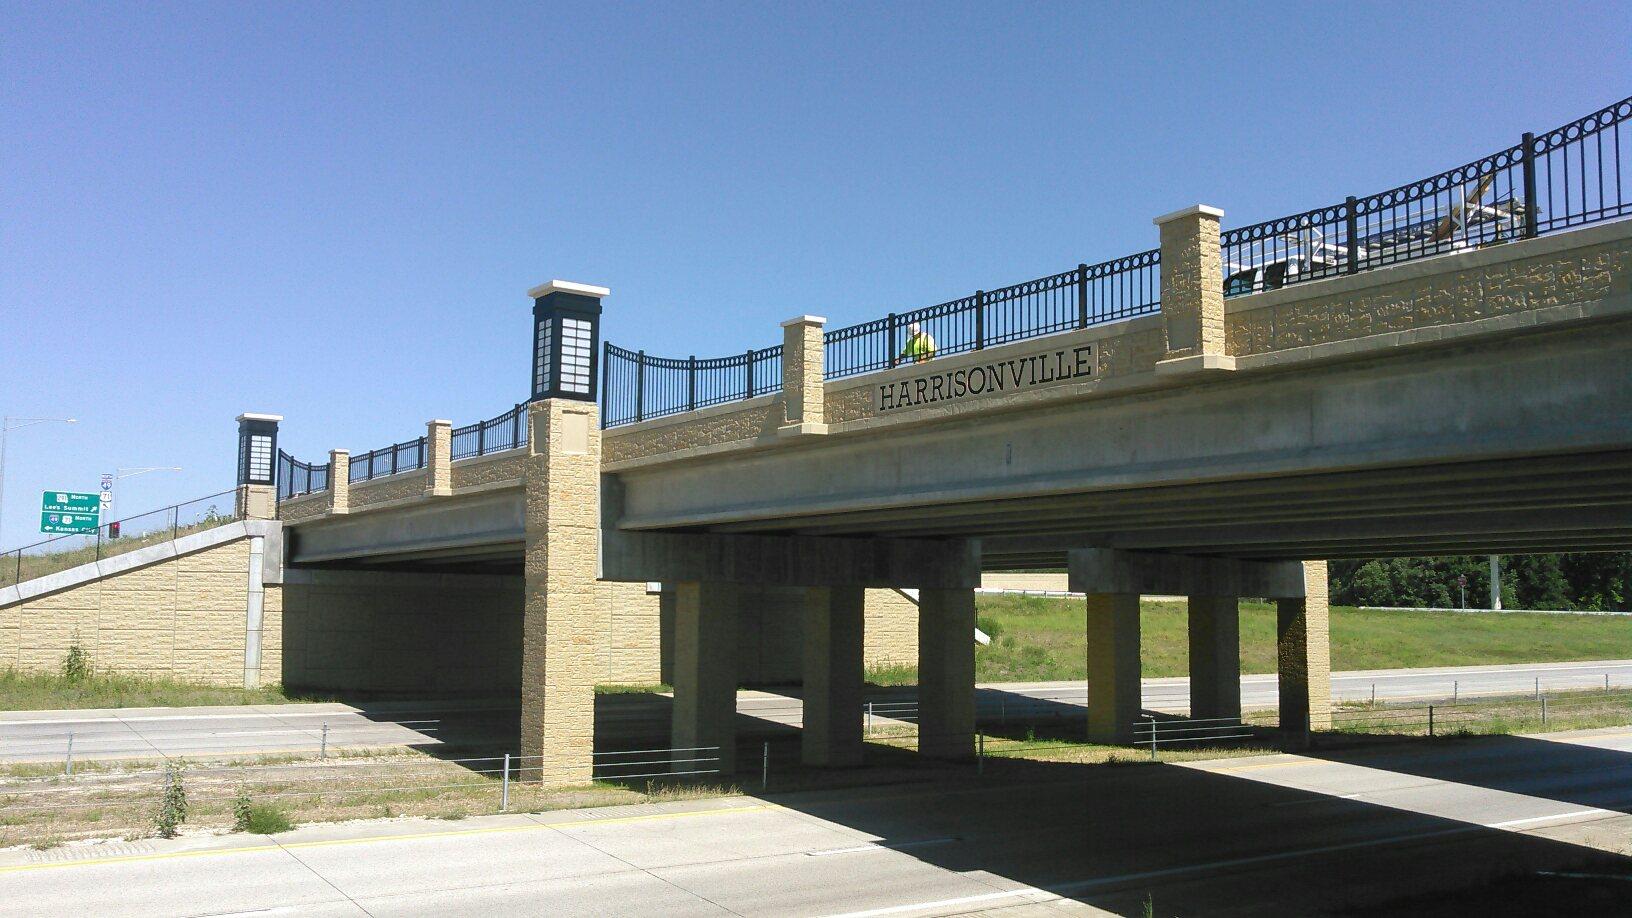 Rte 291 Bridge over I-44 Harrisonville, MO